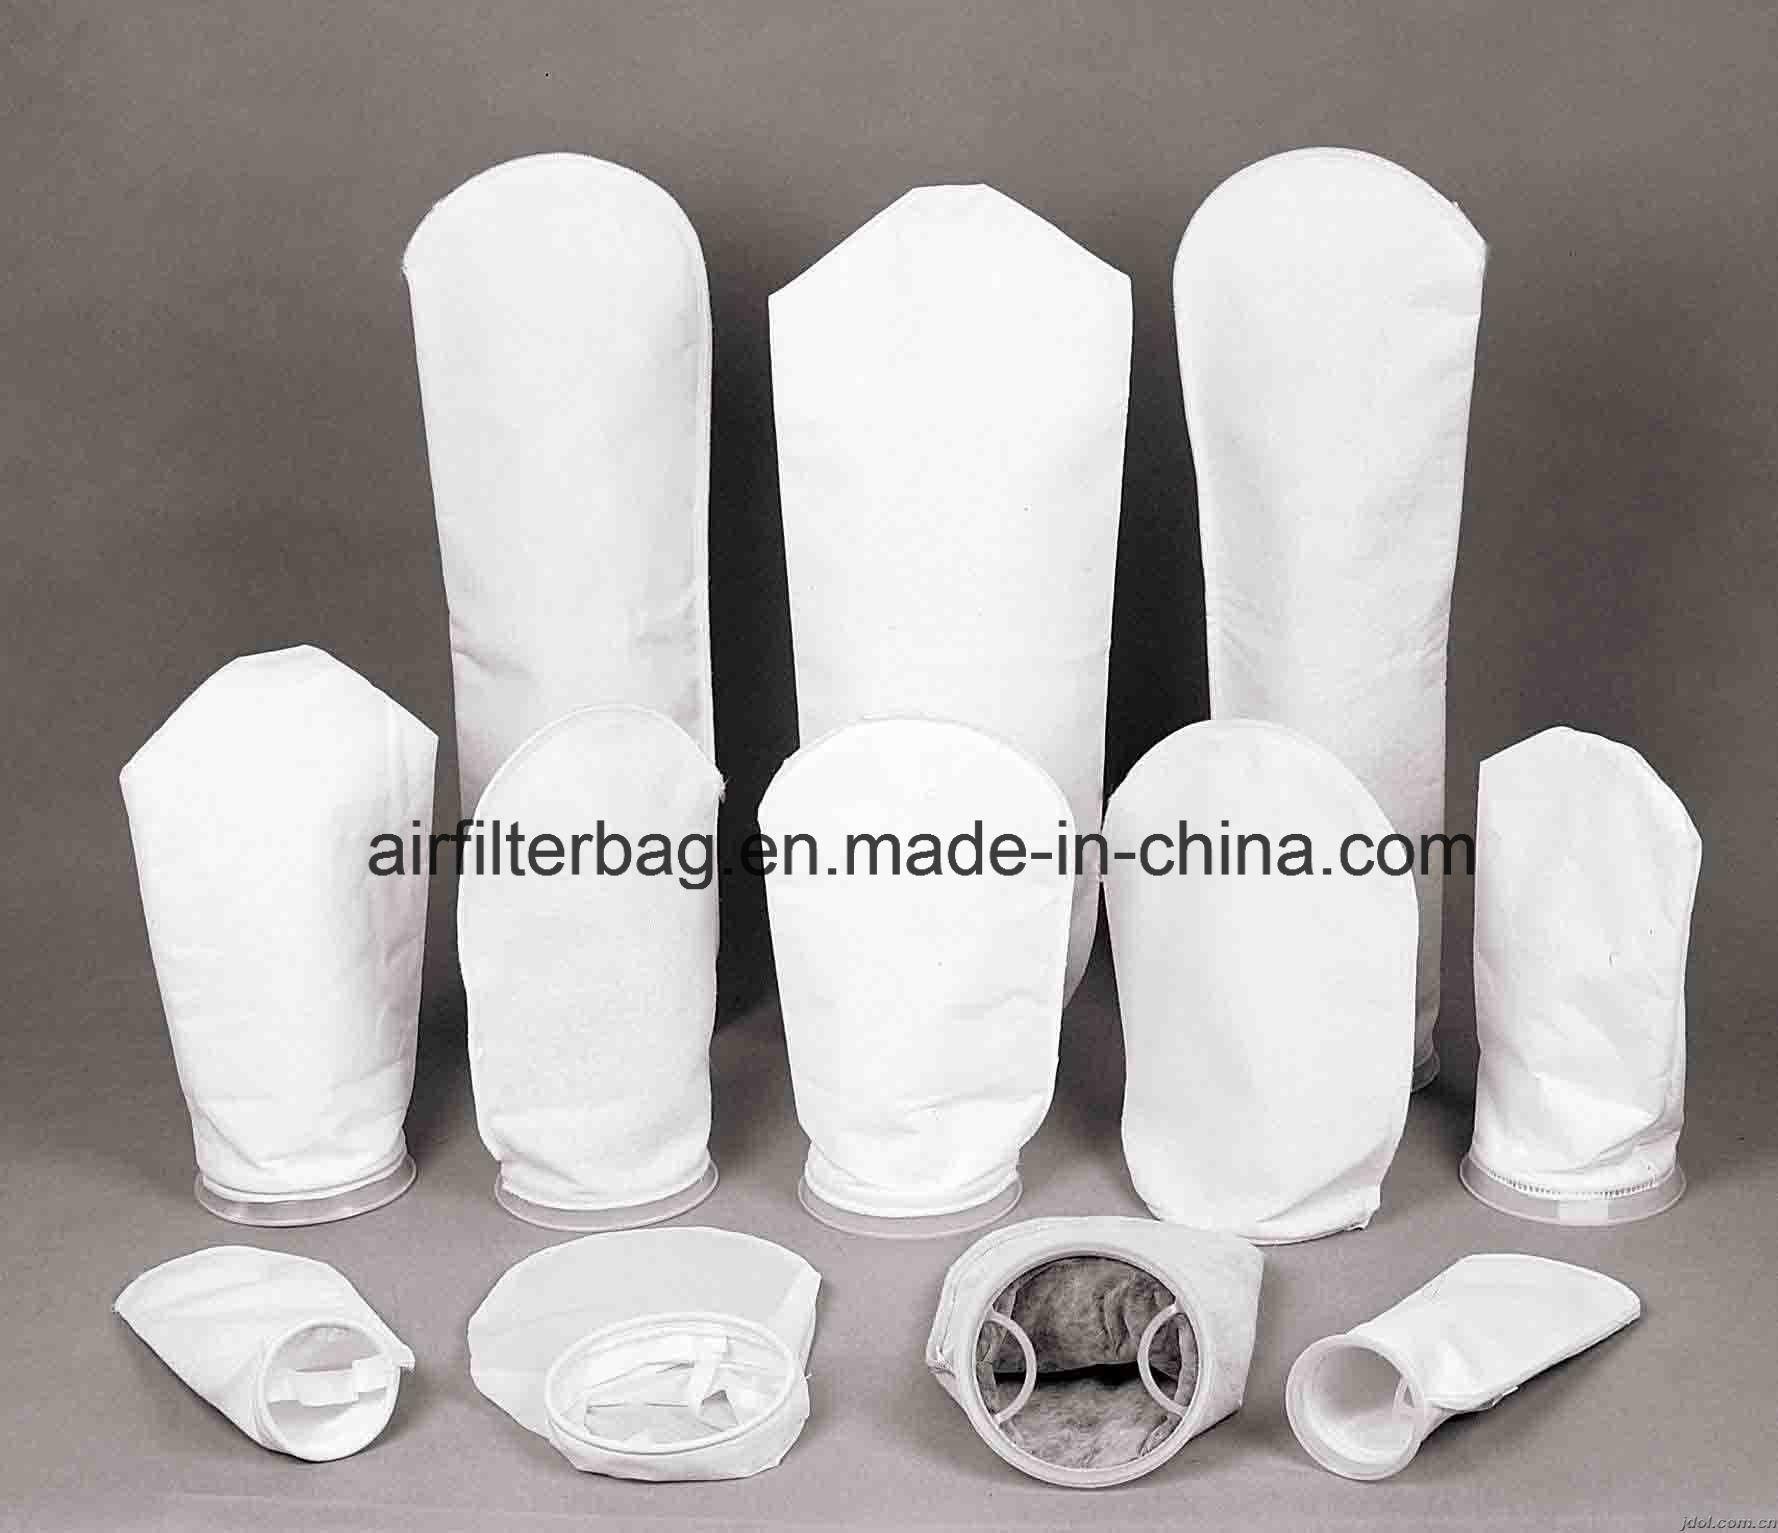 Liquid Filter Bag for Water Treatment